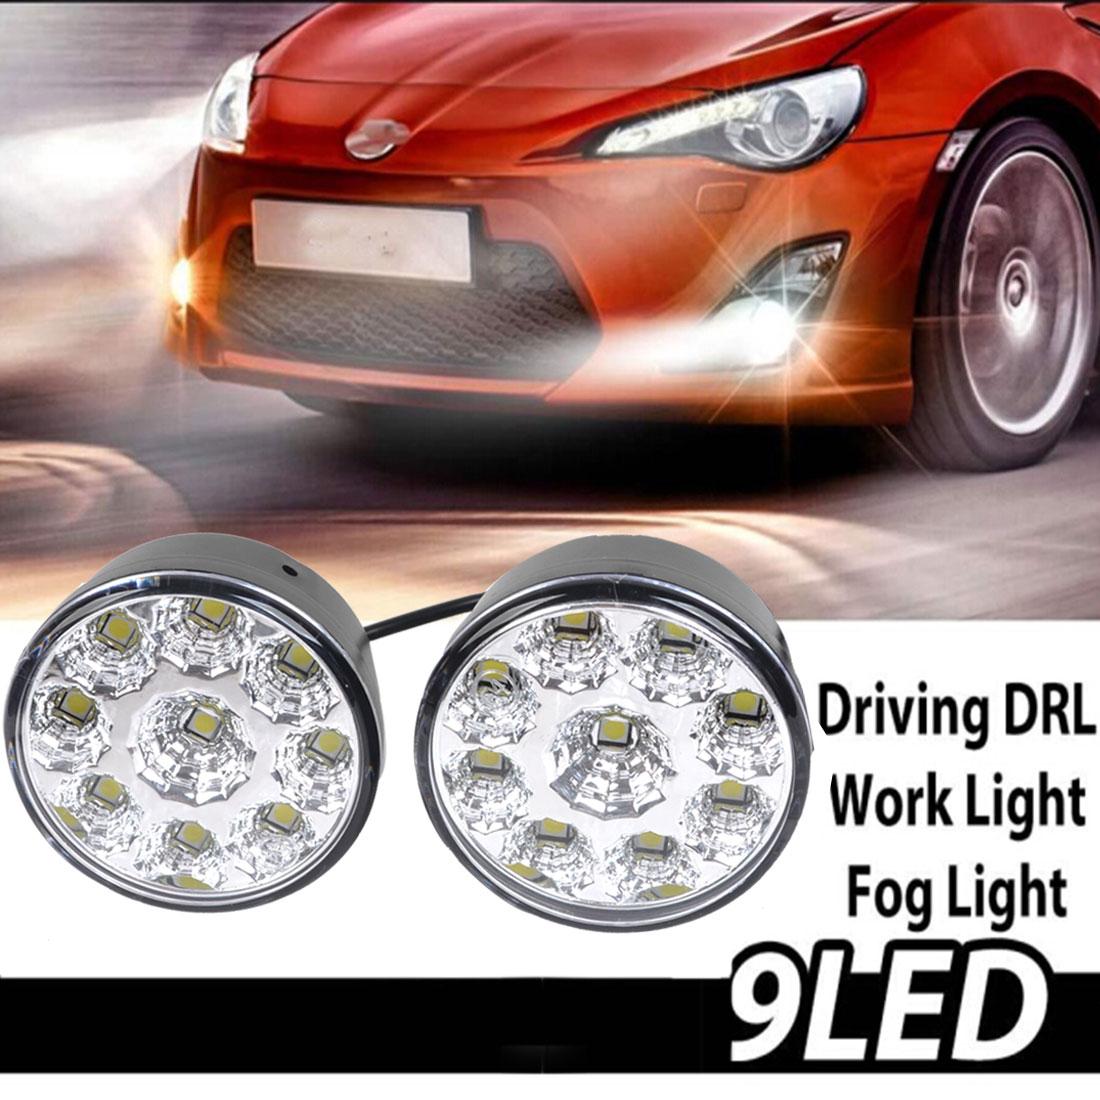 2 Pcs/lot  9 LED Round Daytime Driving Running Light DRL Car Fog Lamp Headlight White Discount 50 Size 70 x 45mm(H*D)(China (Mainland))